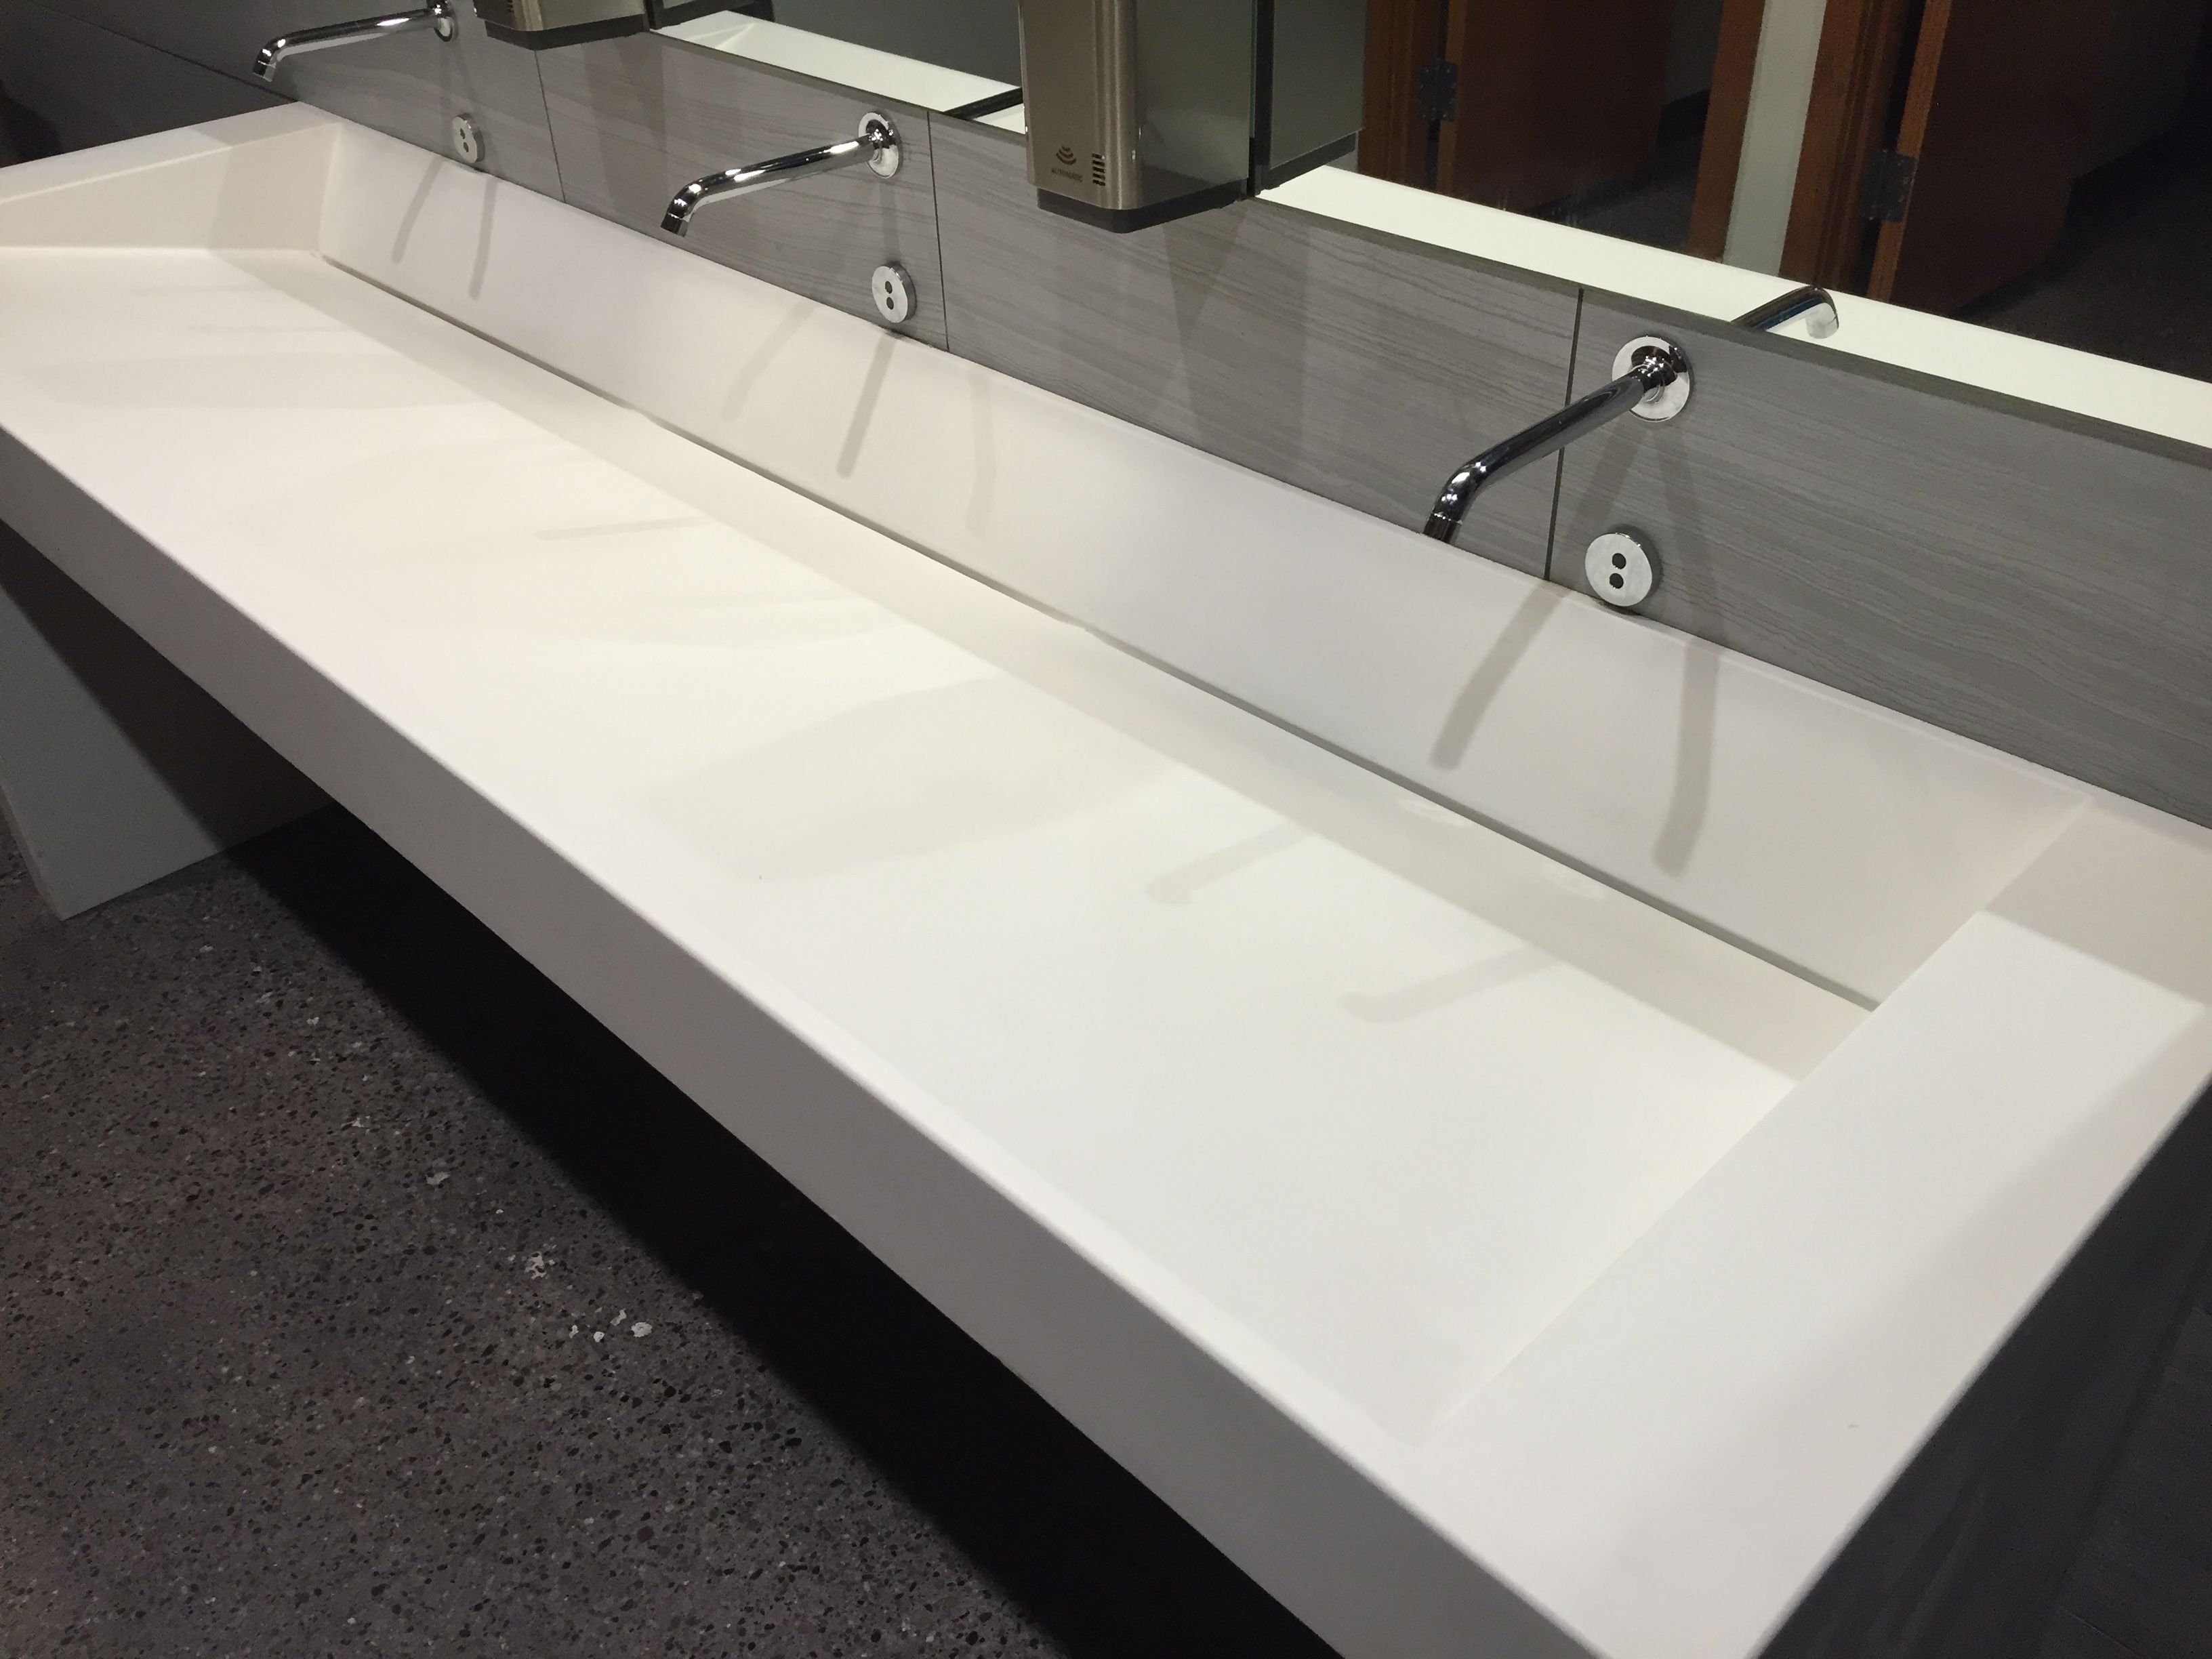 Vandermill Cider - Grand Rapids, MI Precast Concrete Trough Sink ...